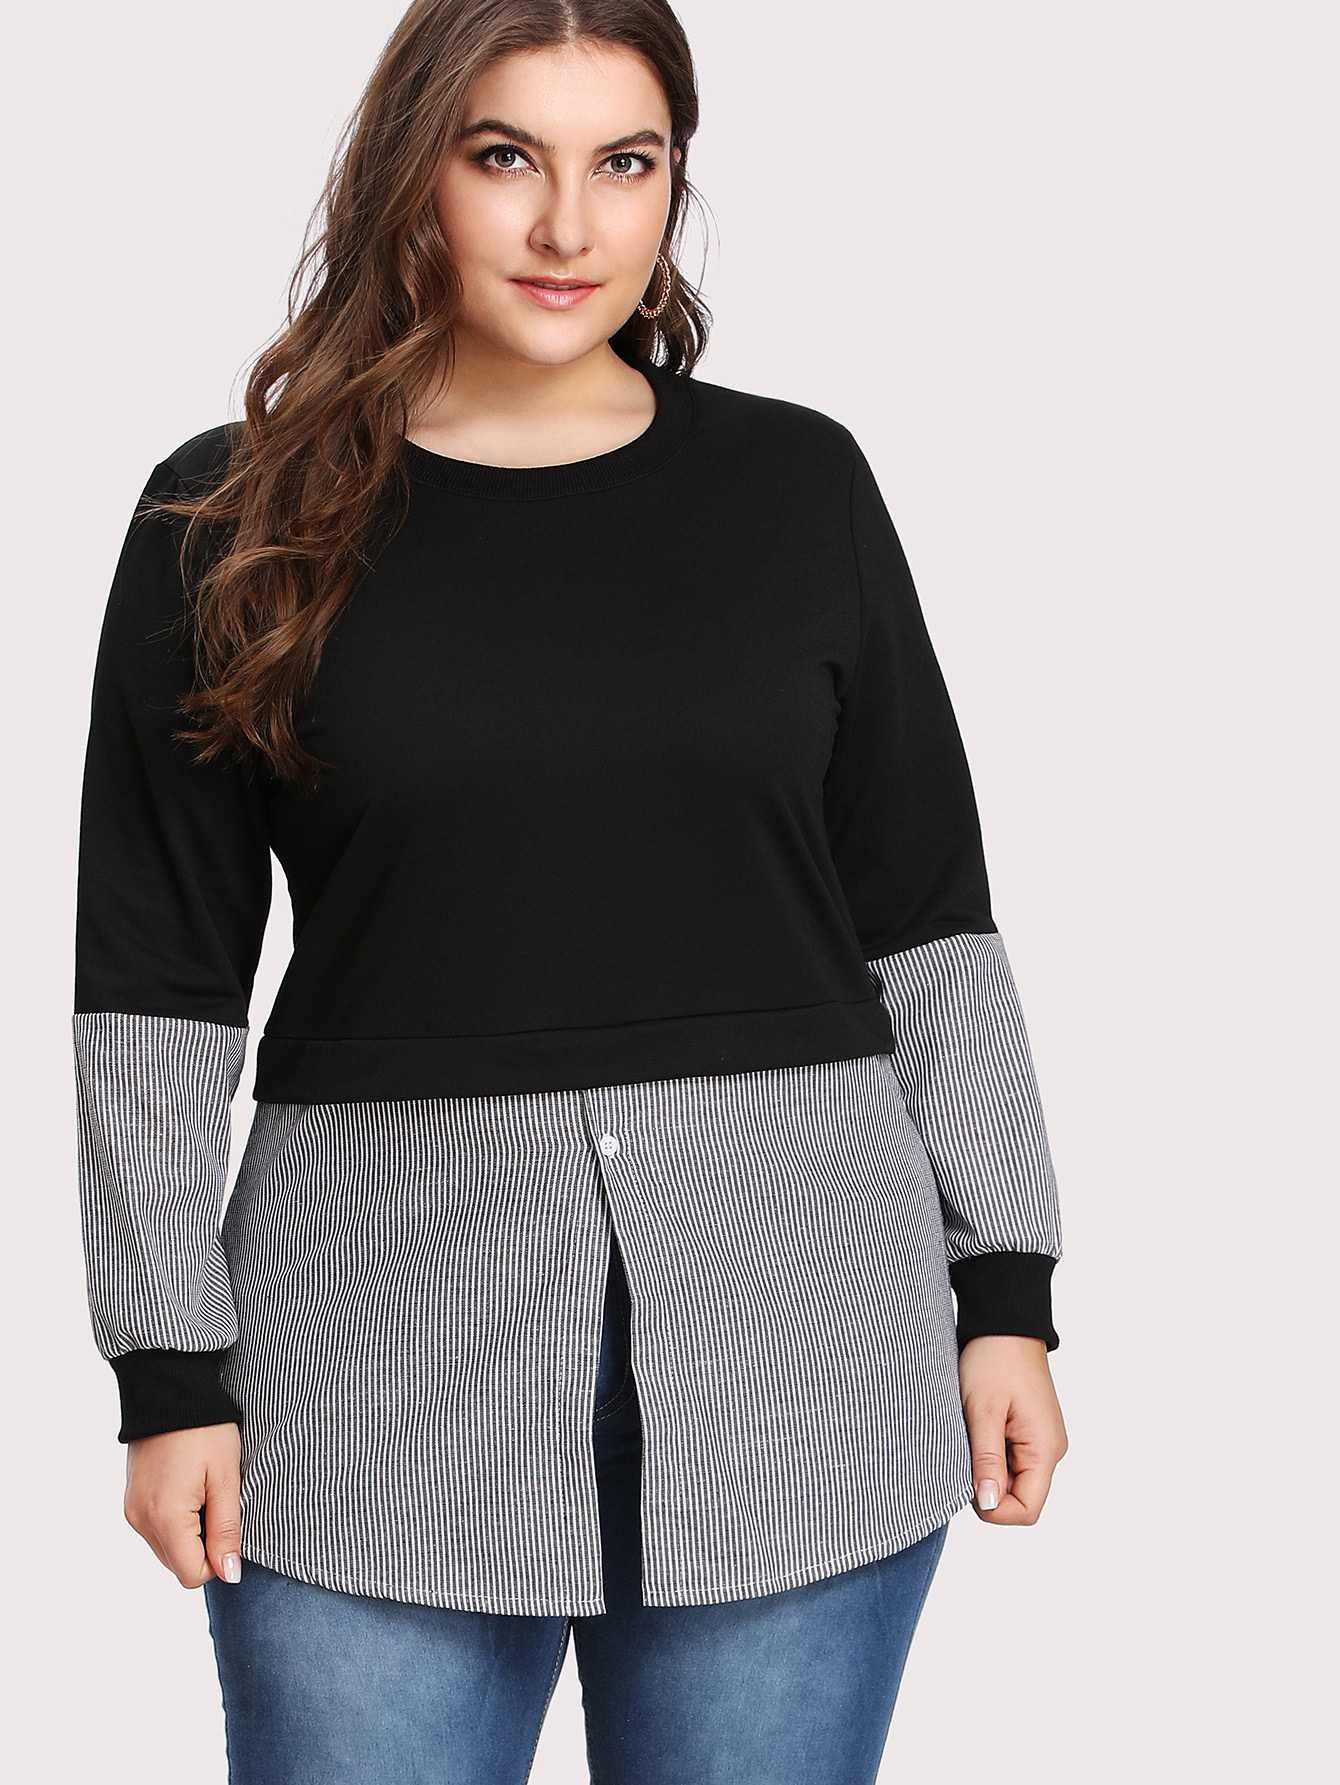 Contrast Stripe 2 In 1 Pullover